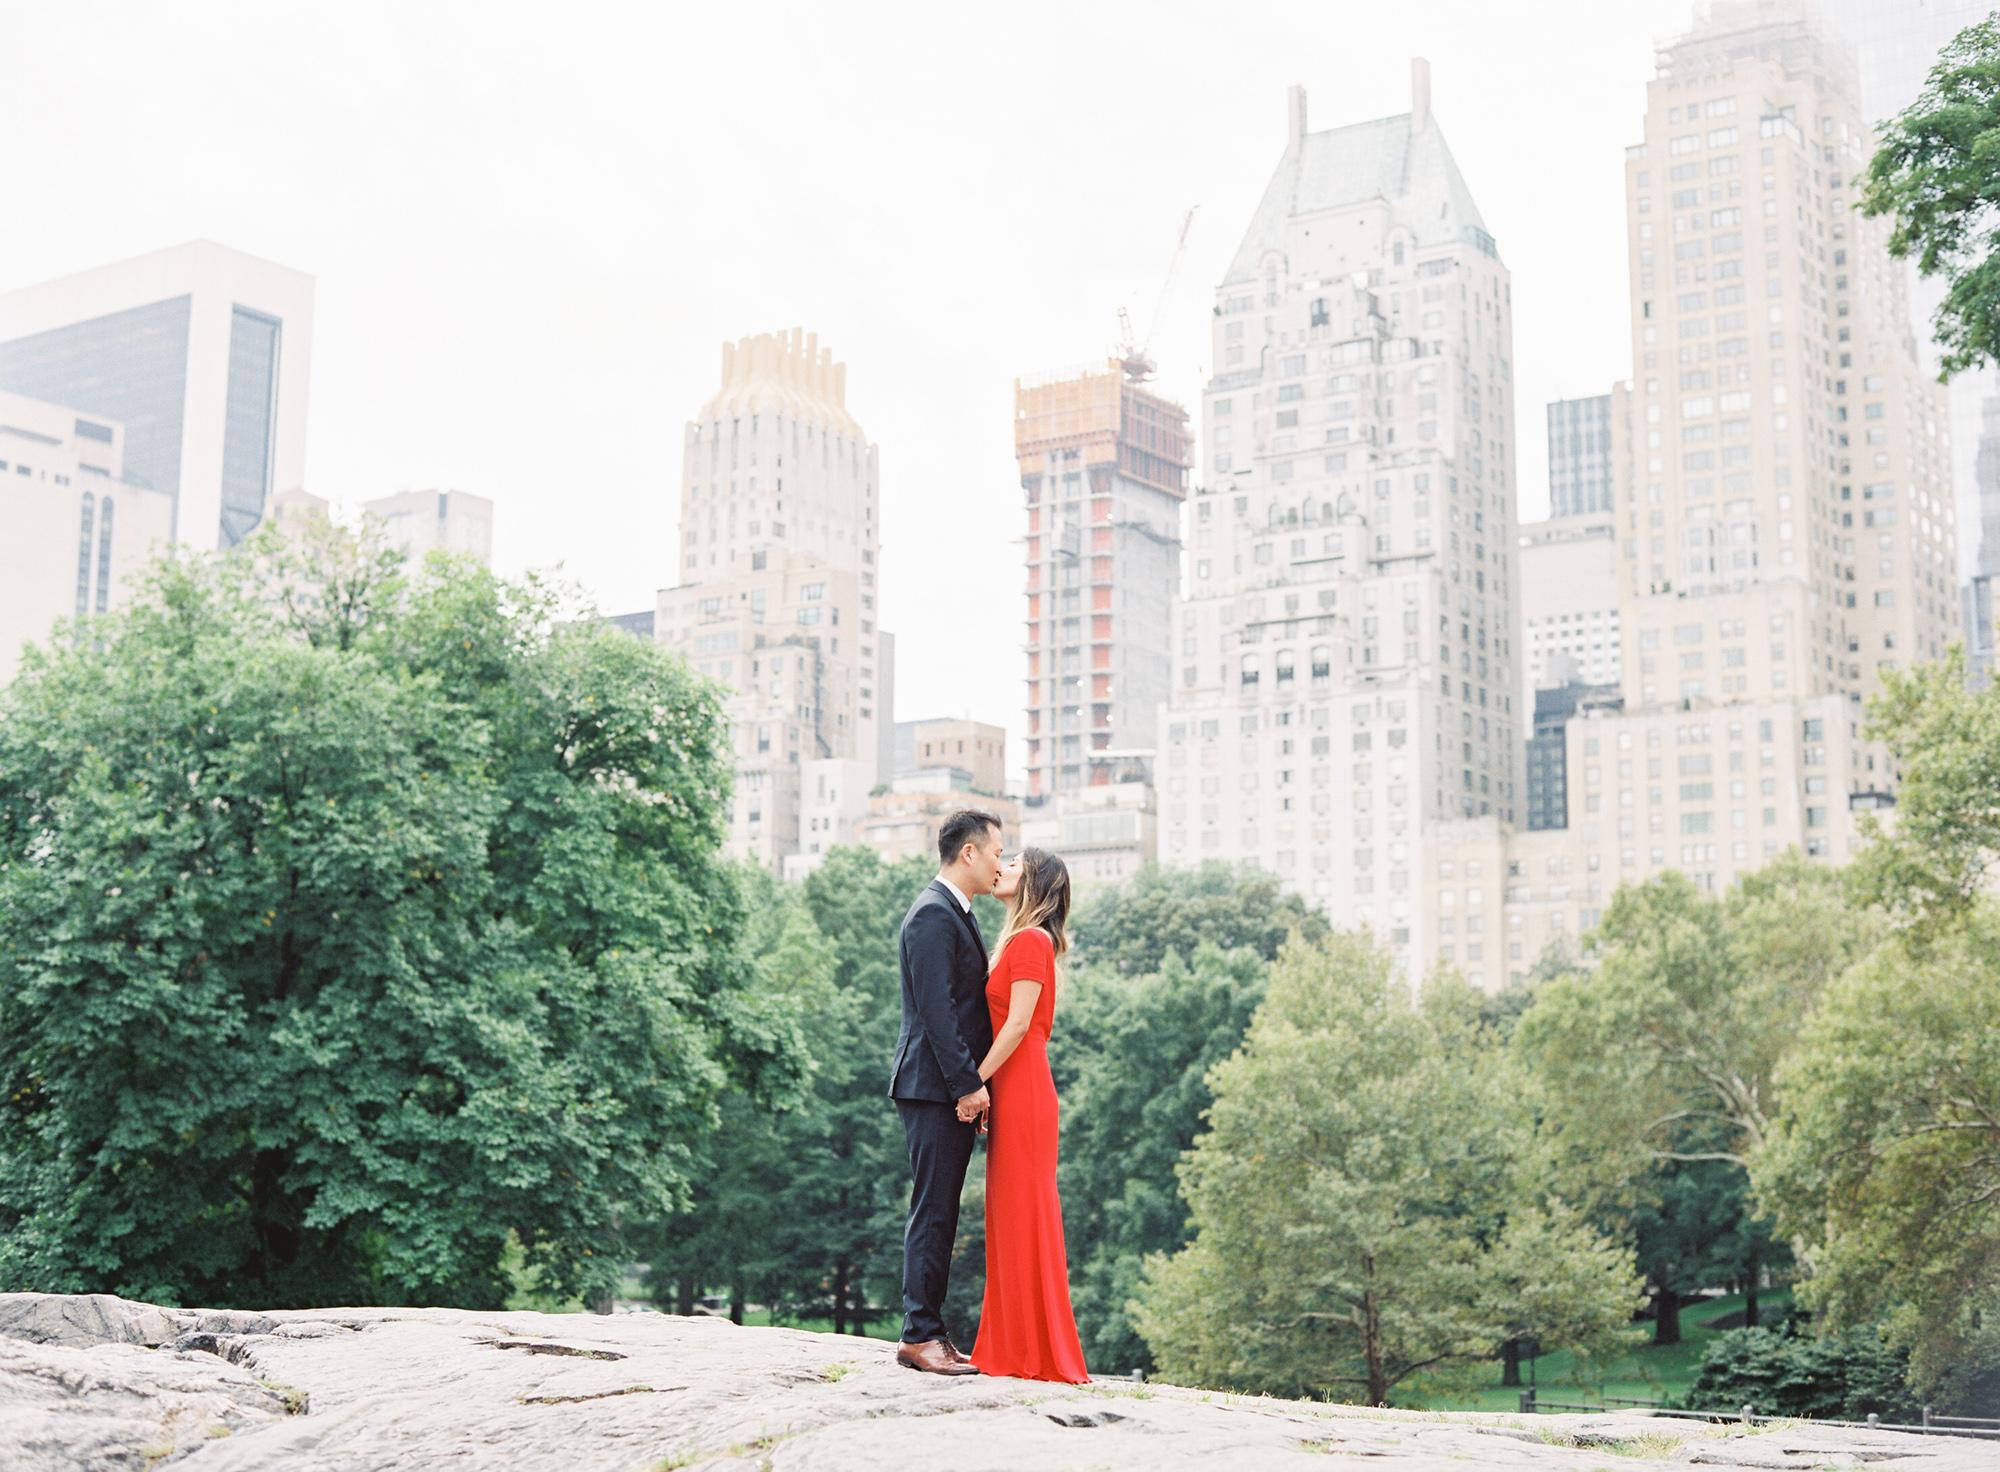 New-York-Film-Engagement-Session-Brooklyn-Bridge-Central-Park-28.jpg